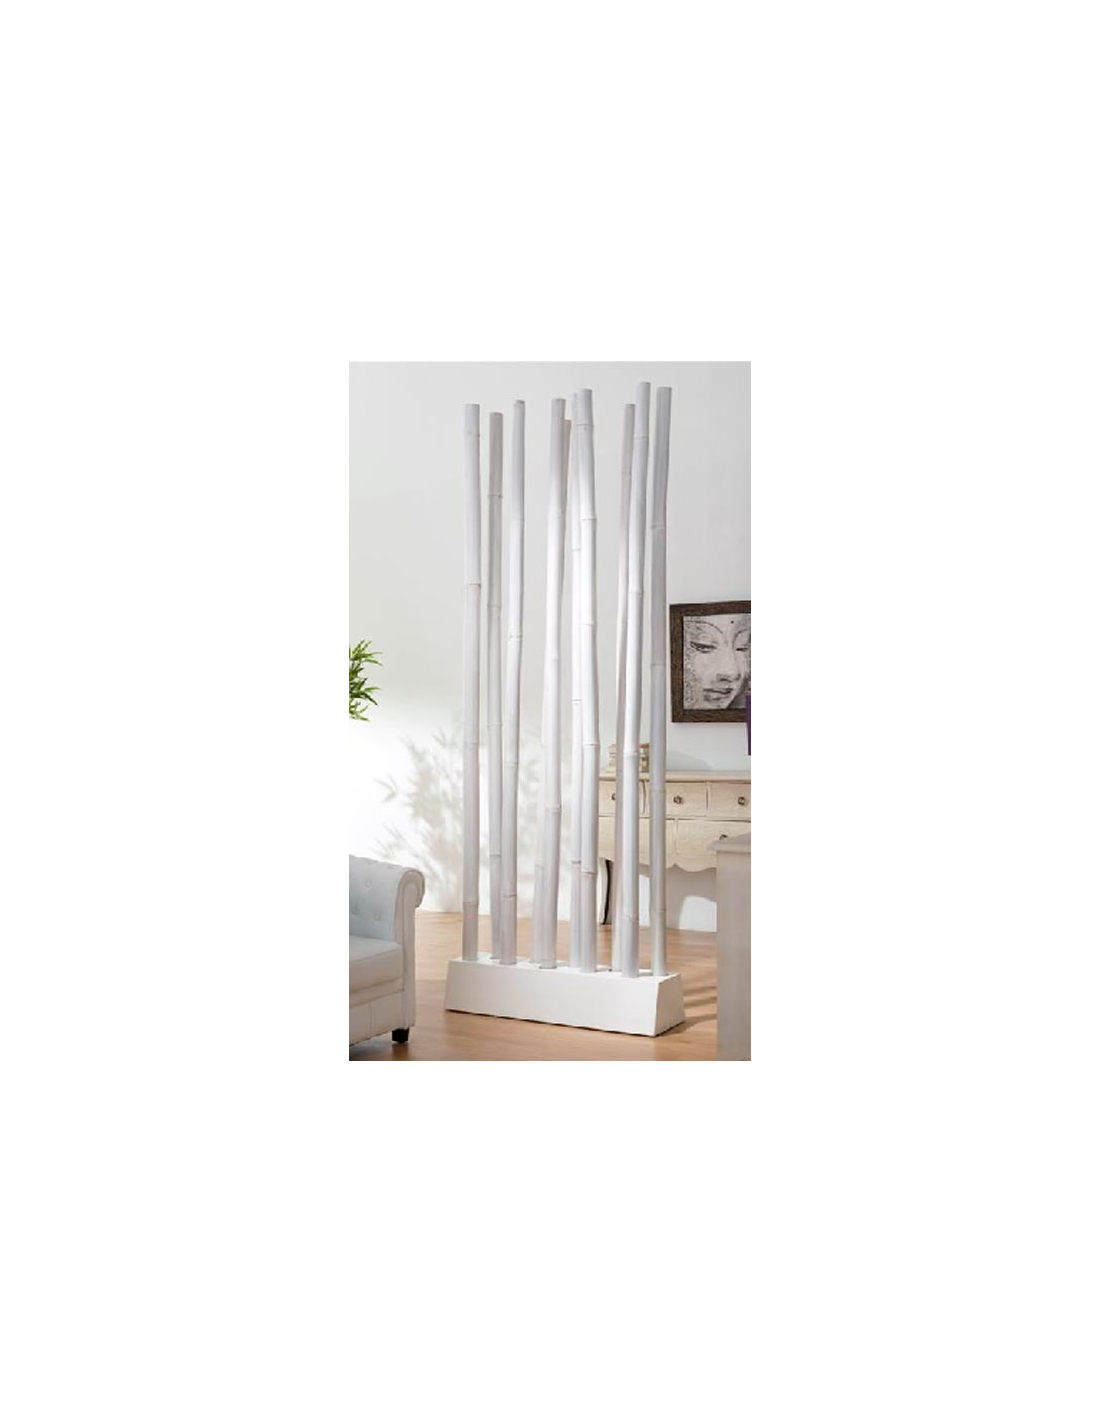 Bambu Decoracion Comprar ~ Mueble auxiliar > Biombos > Separador ambientes de ca?as de bamb?